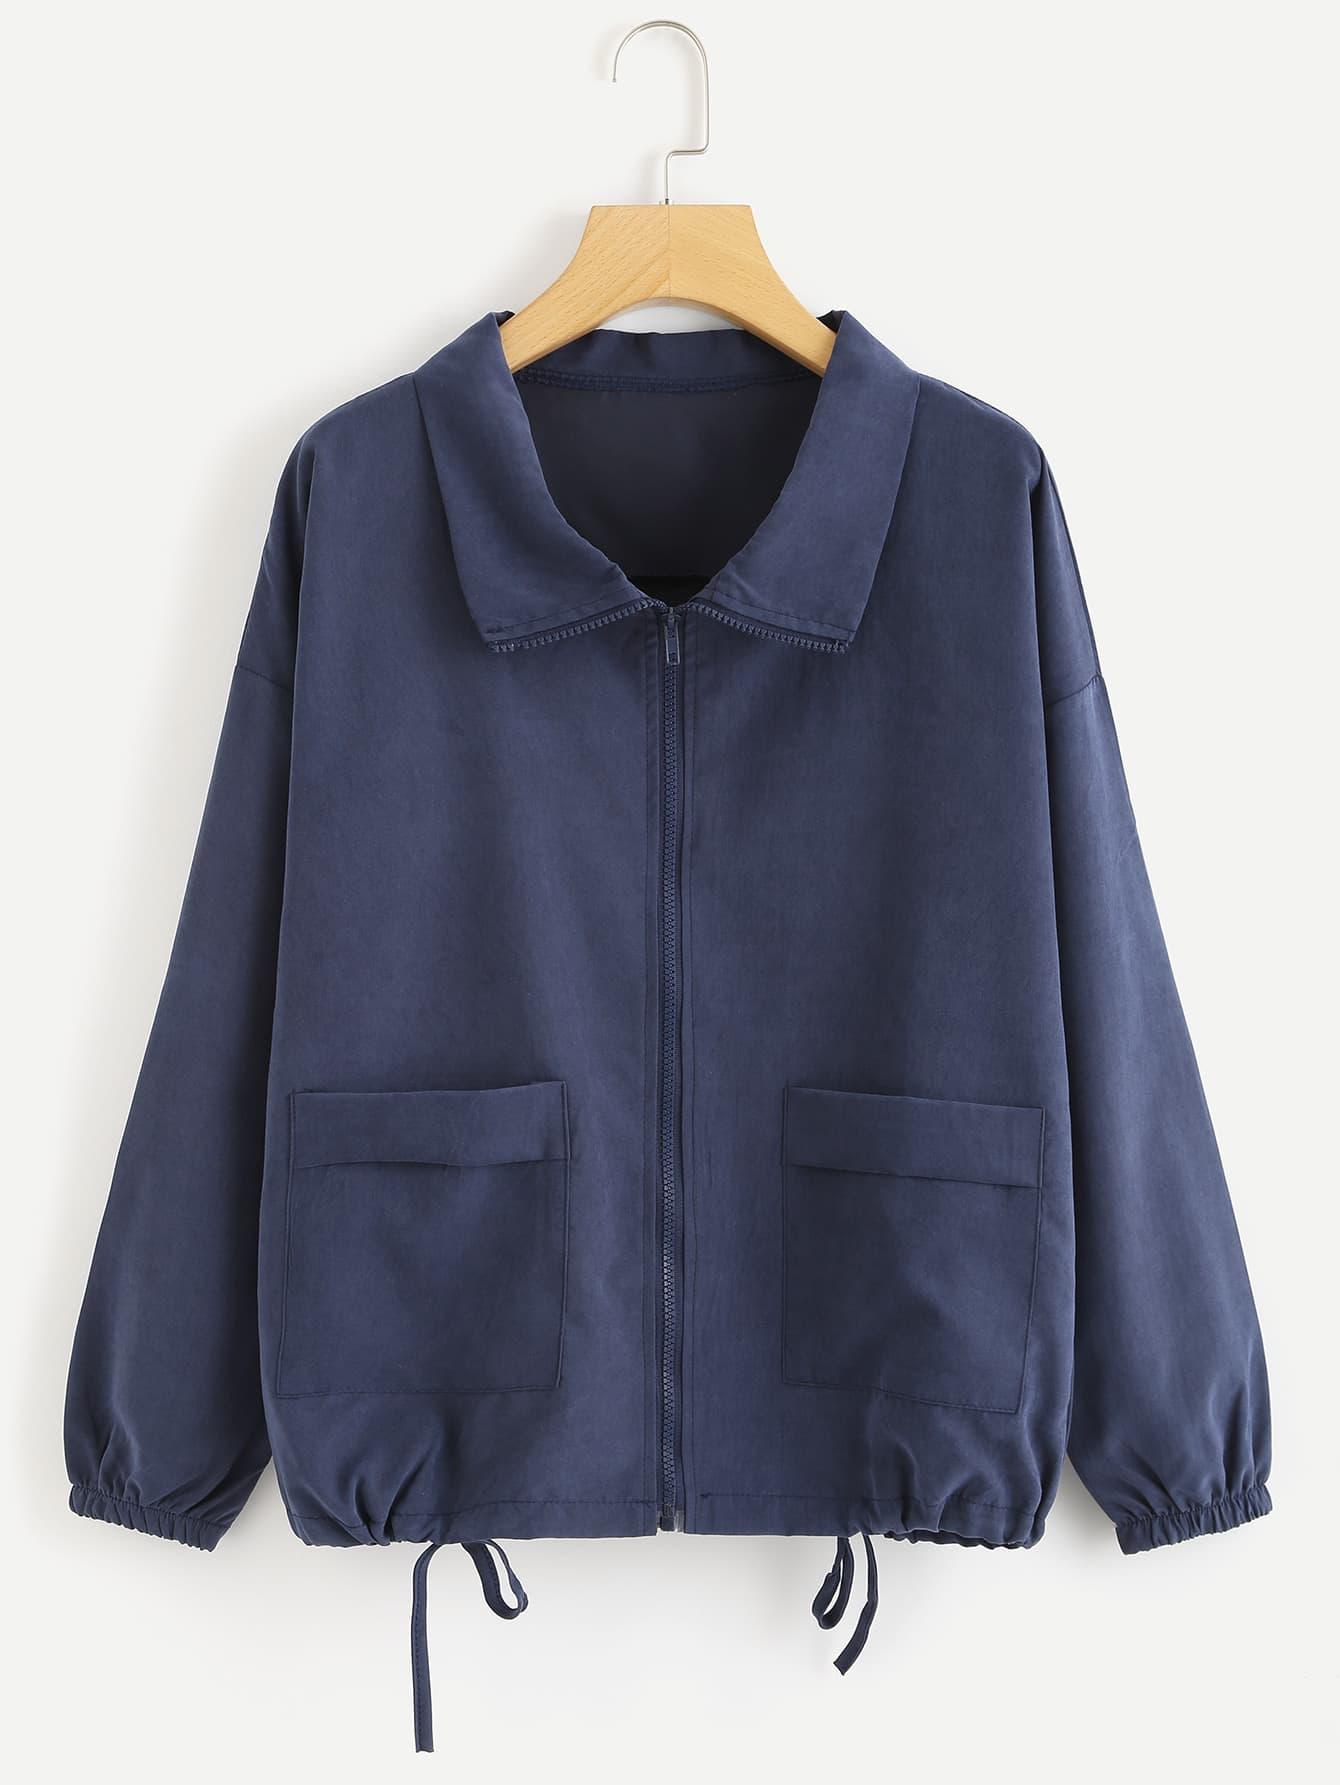 Dual Pocket Drawstring Hem Jacket